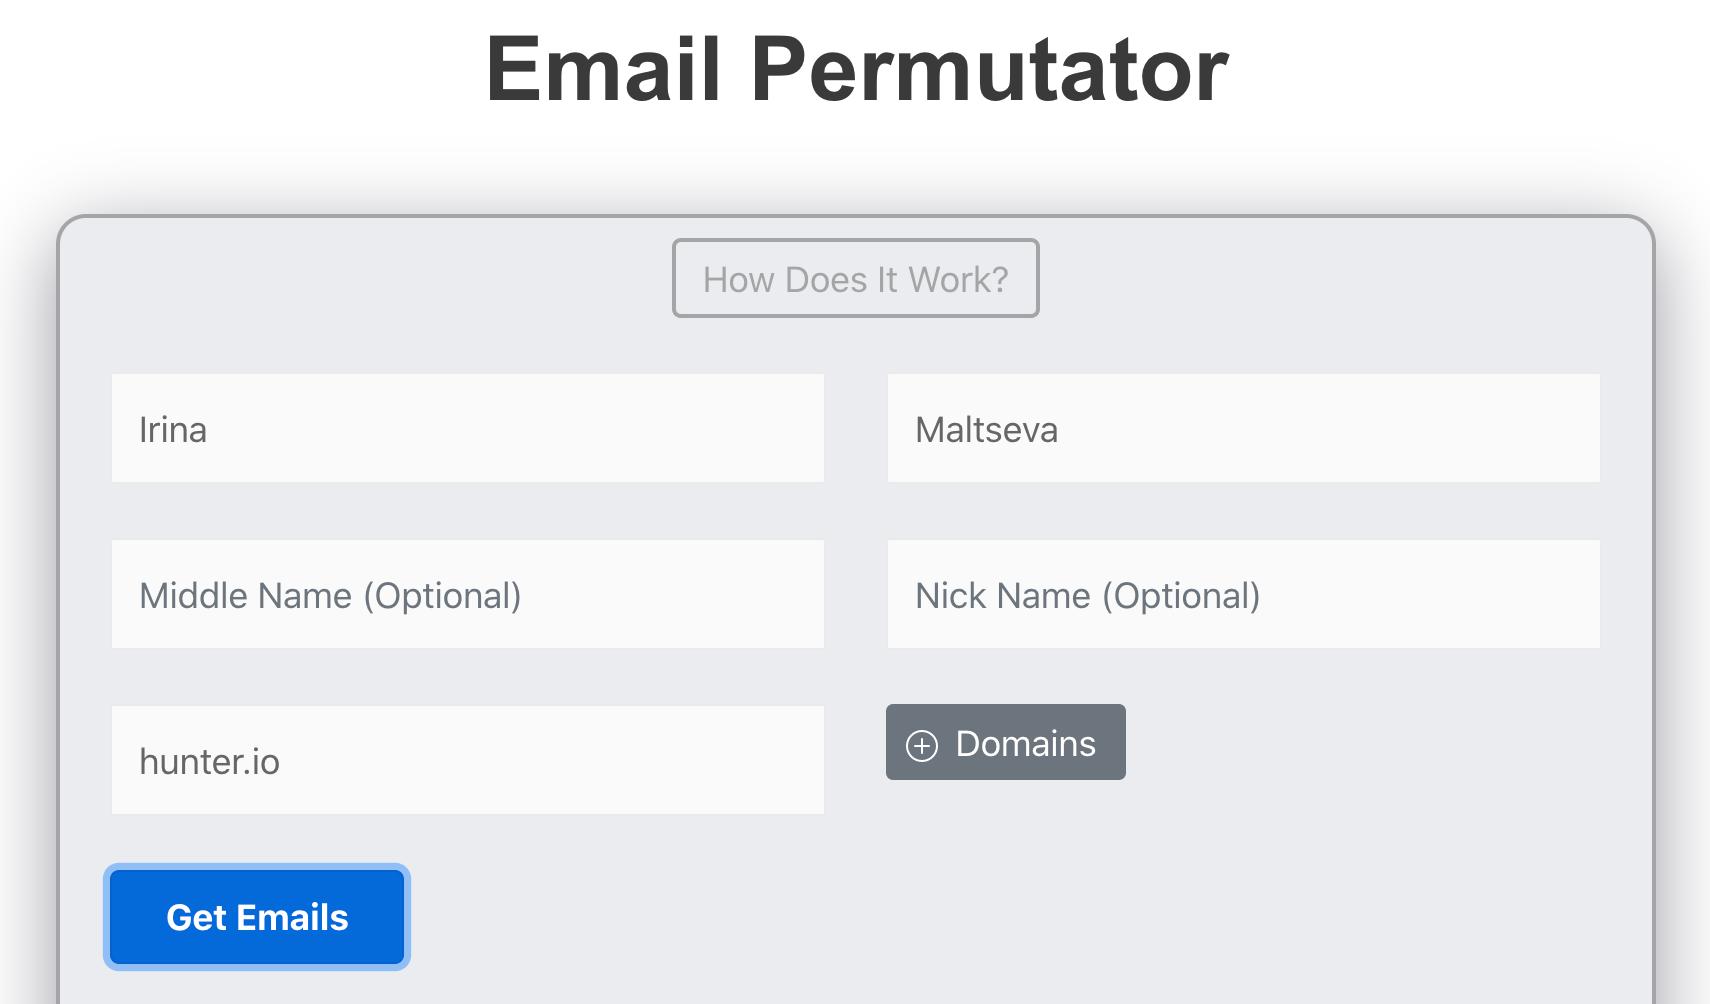 Email Permutator tool